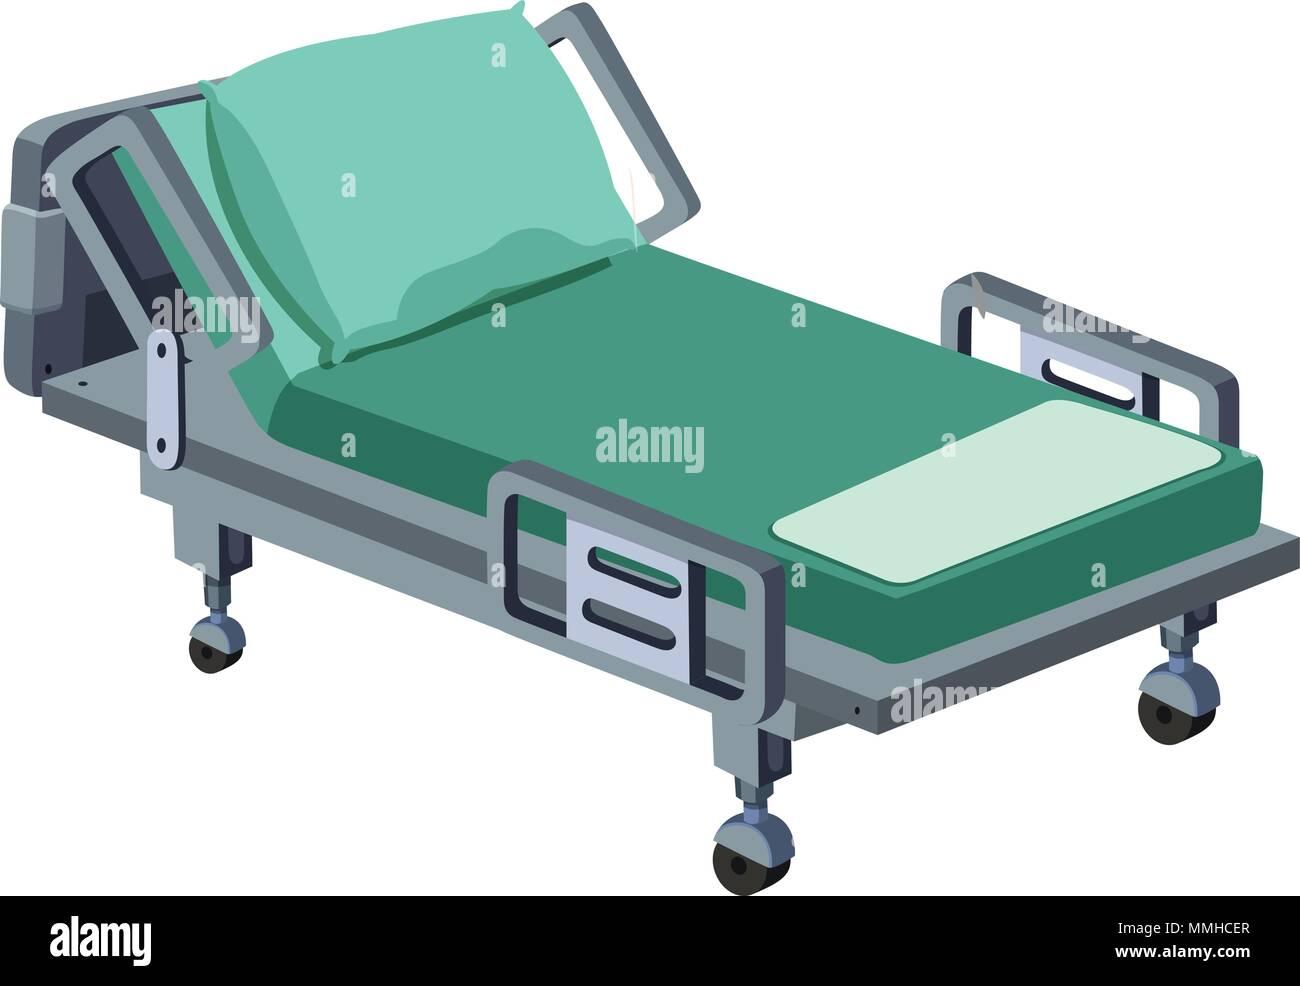 A Modern Hospital Bed On White Background Illustration